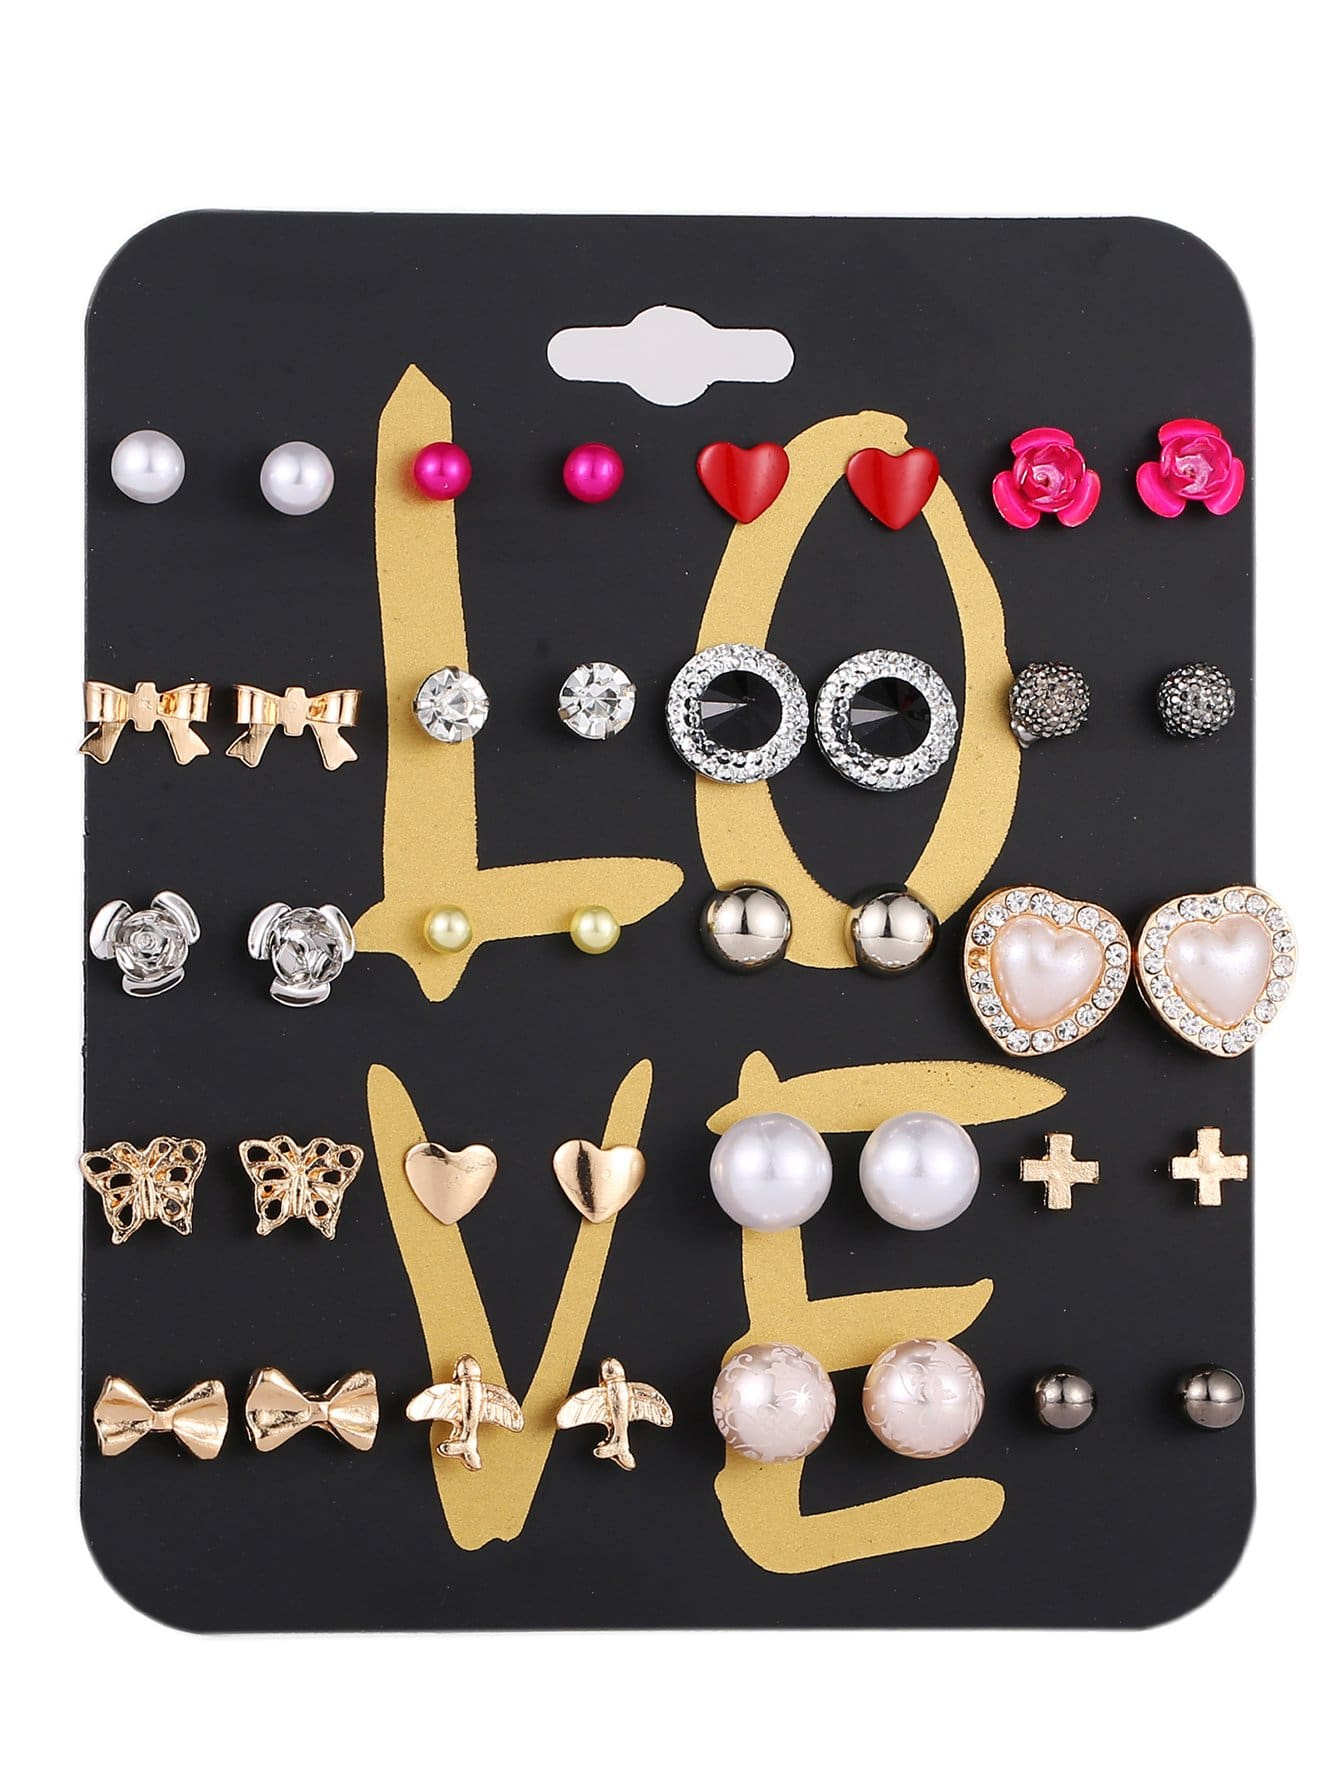 Multishaped Stud Earrings 20pairs